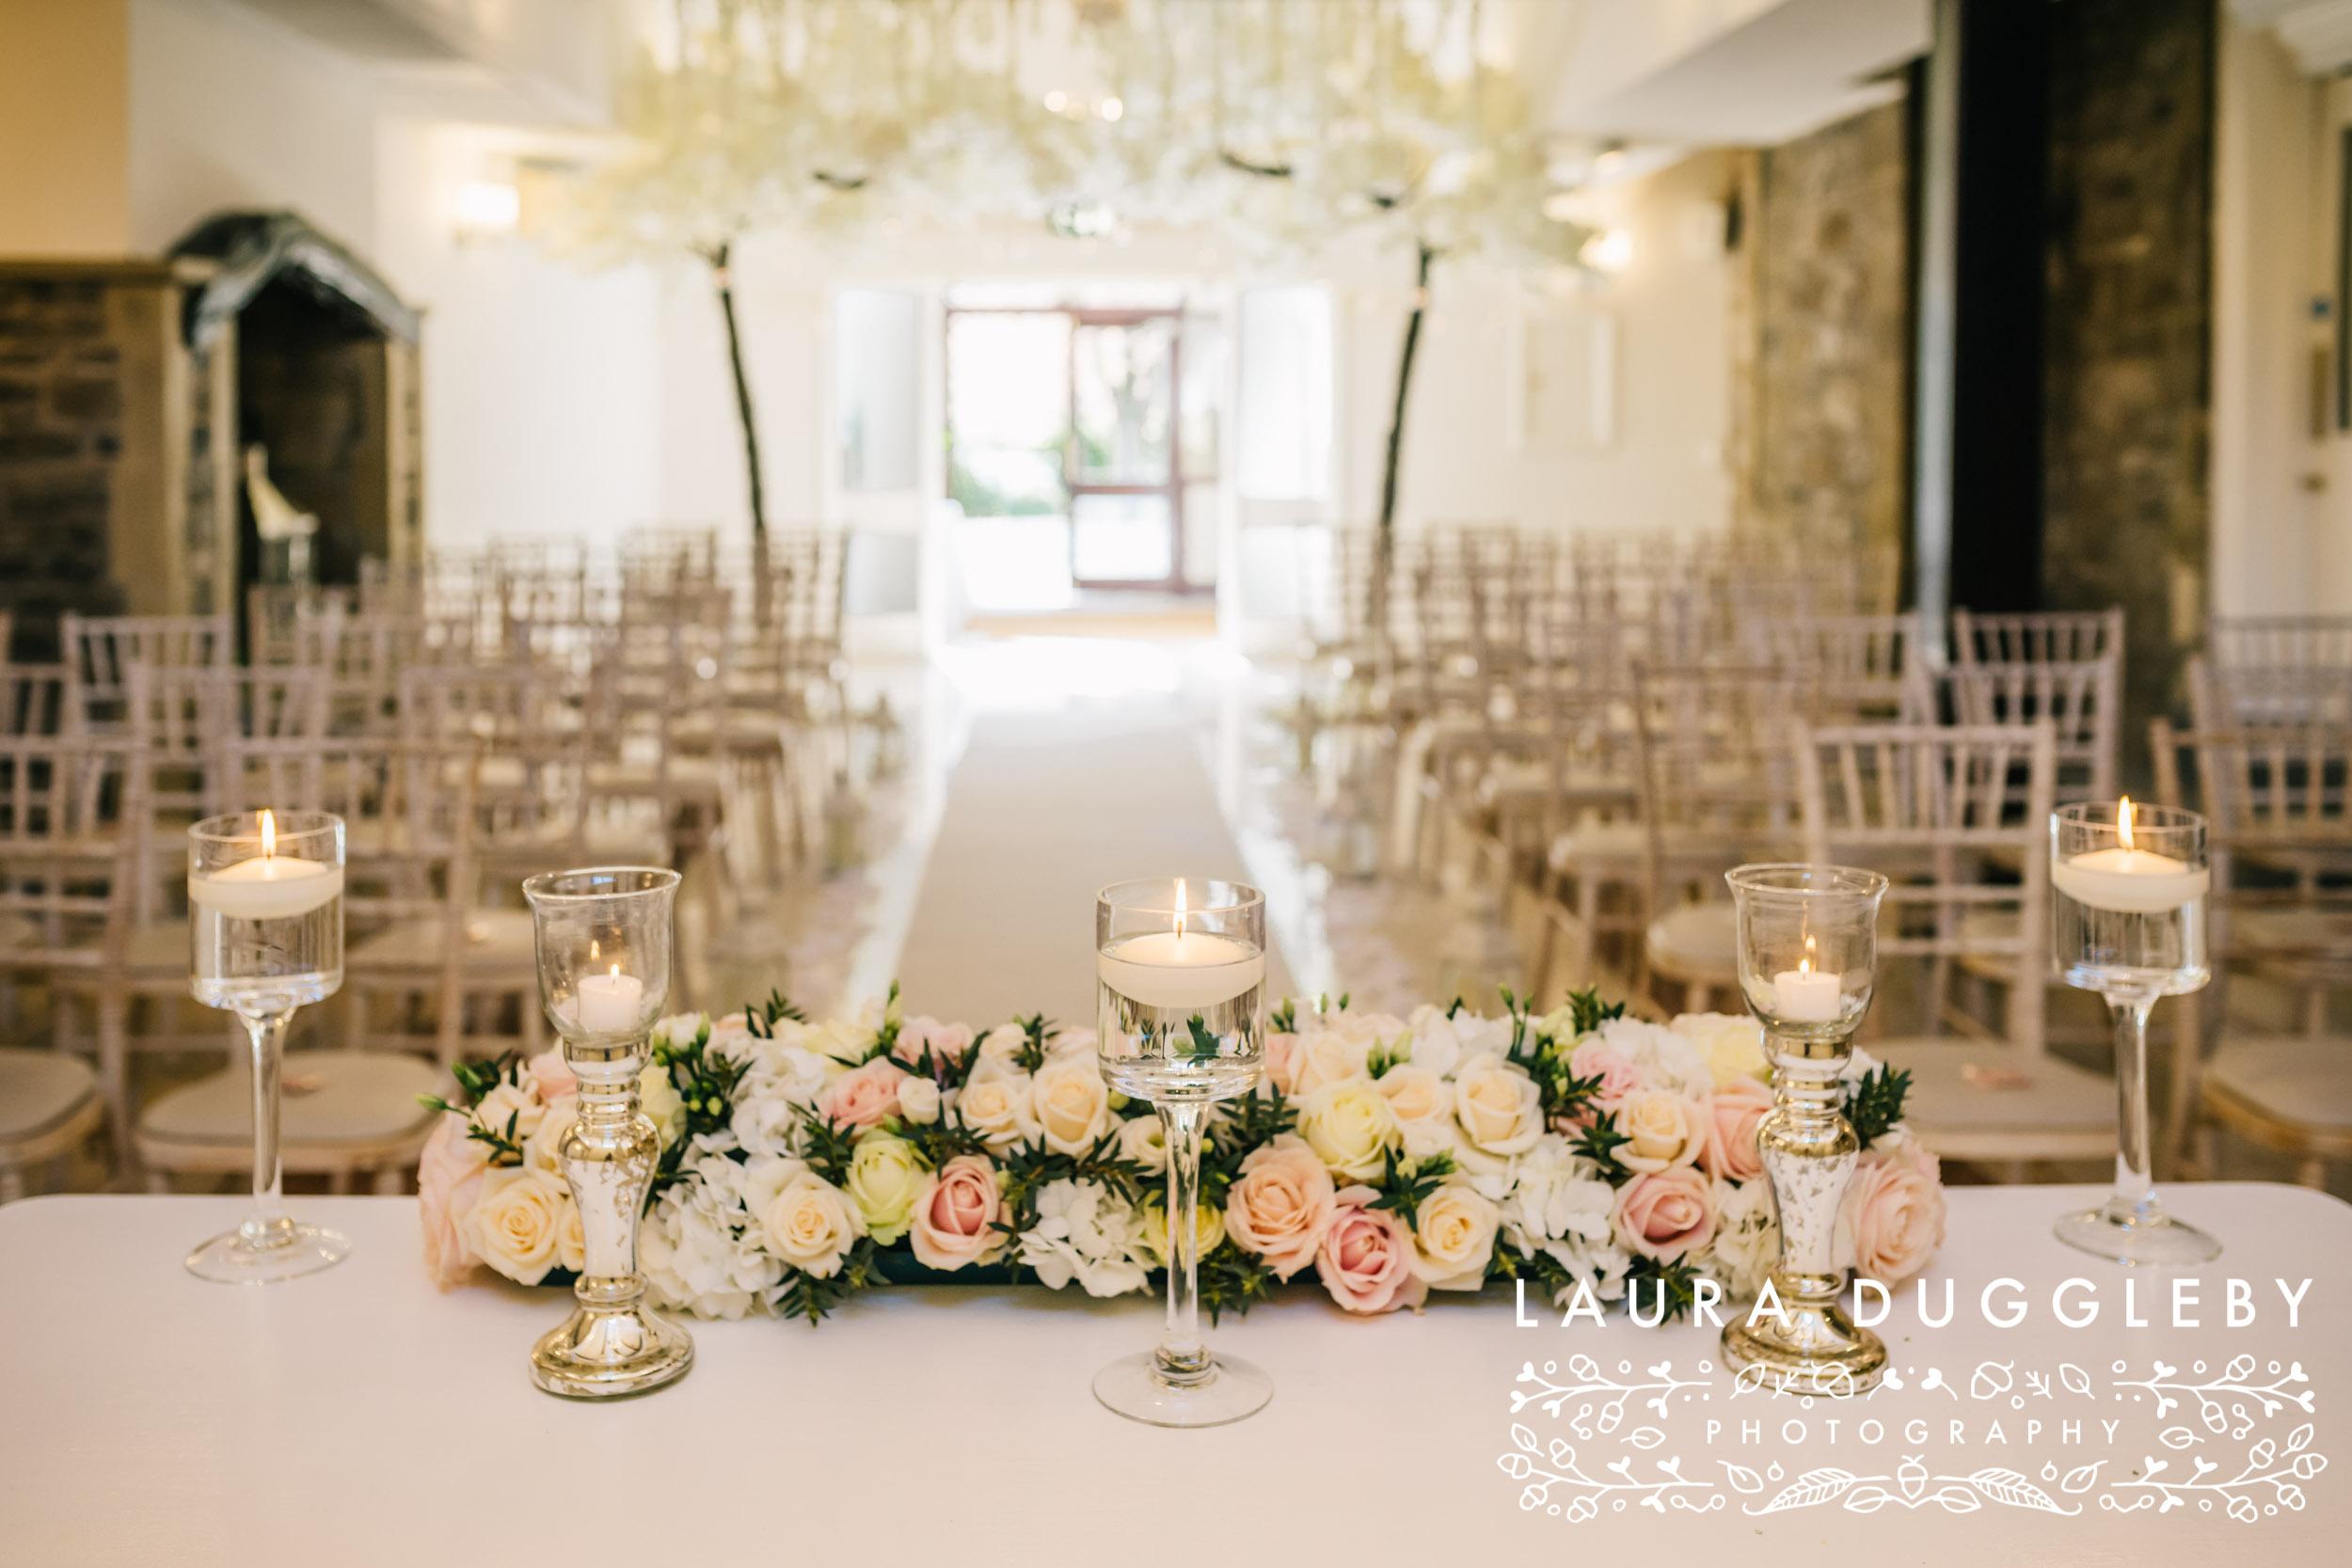 Stirk Hpuse Wedding Photography - Lancashire Photographer-7.jpg